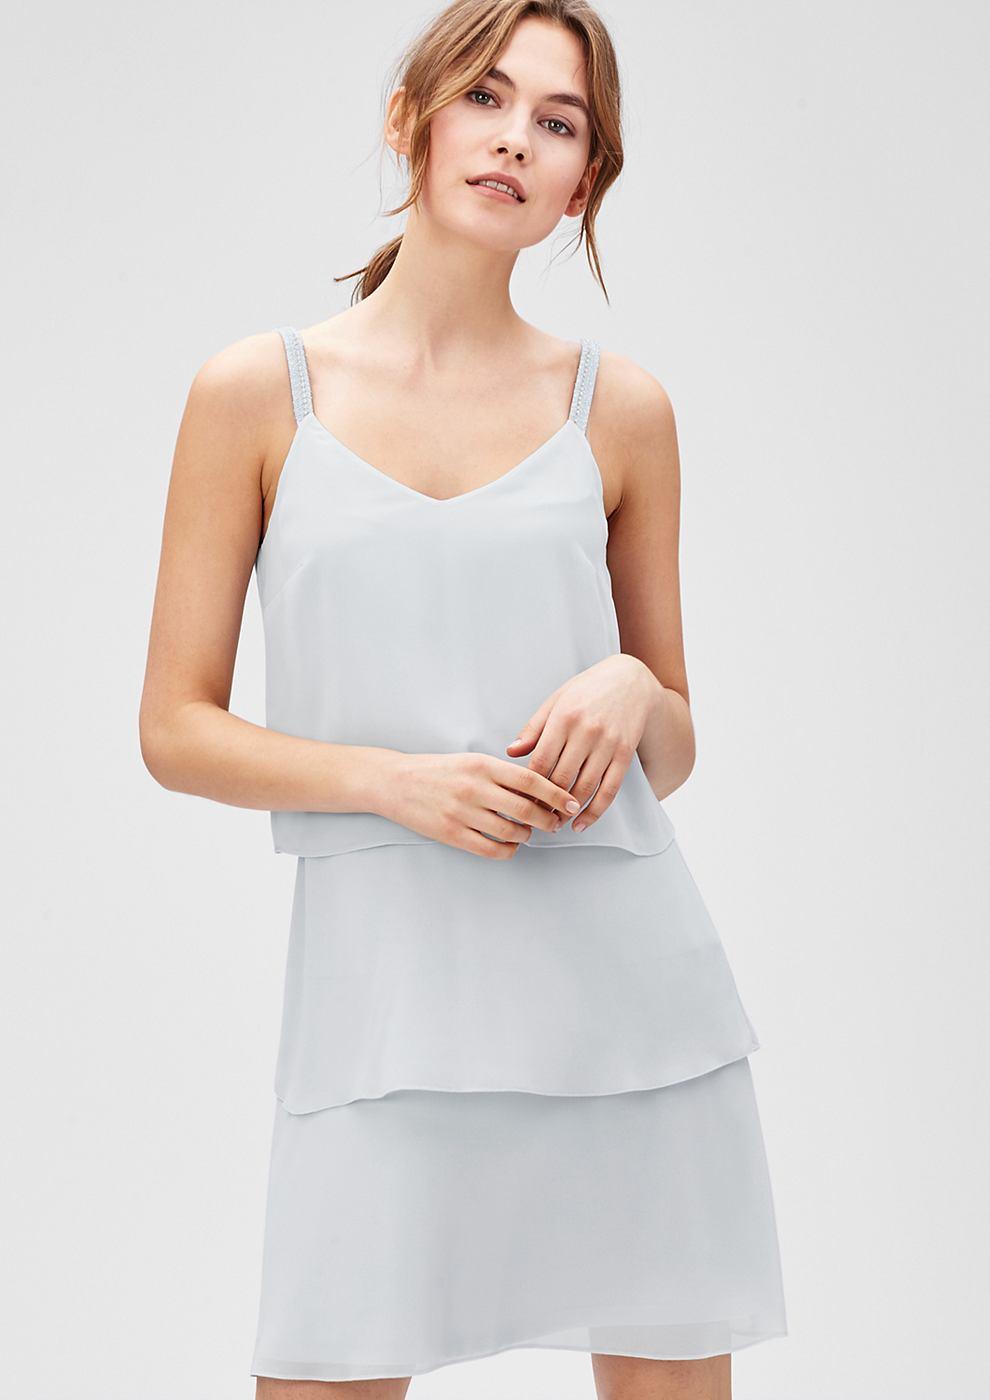 s.Oliver Premium jurk met volants en strasdetails blauw